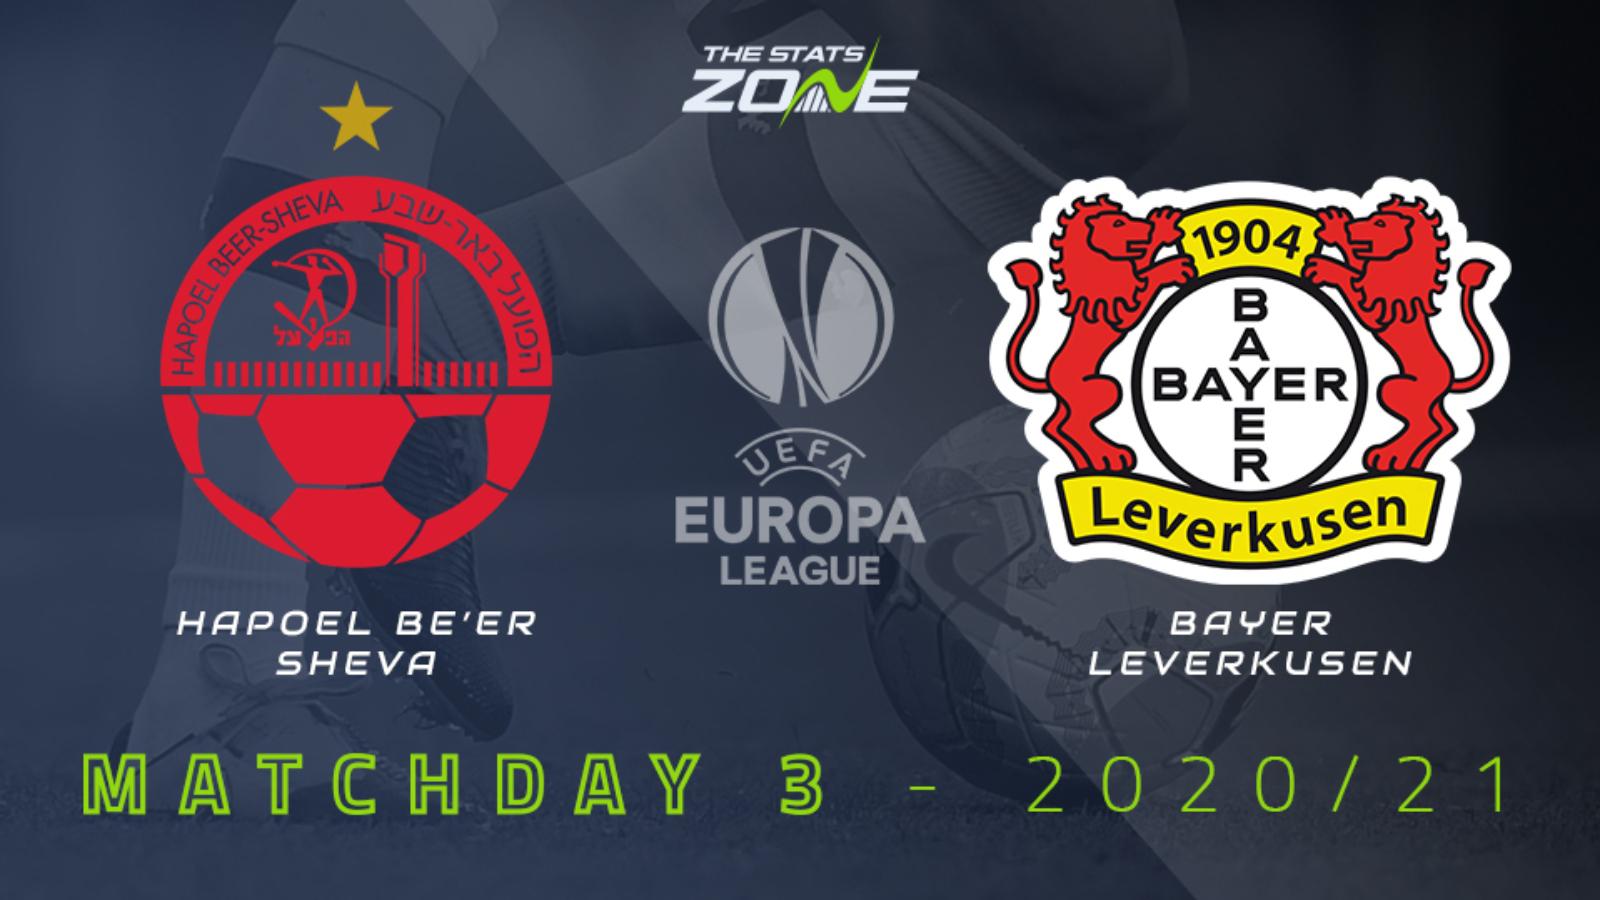 2020-21 UEFA Europa League – Hapoel Be'er Sheva vs Bayer Leverkusen Preview & Prediction - The Stats Zone